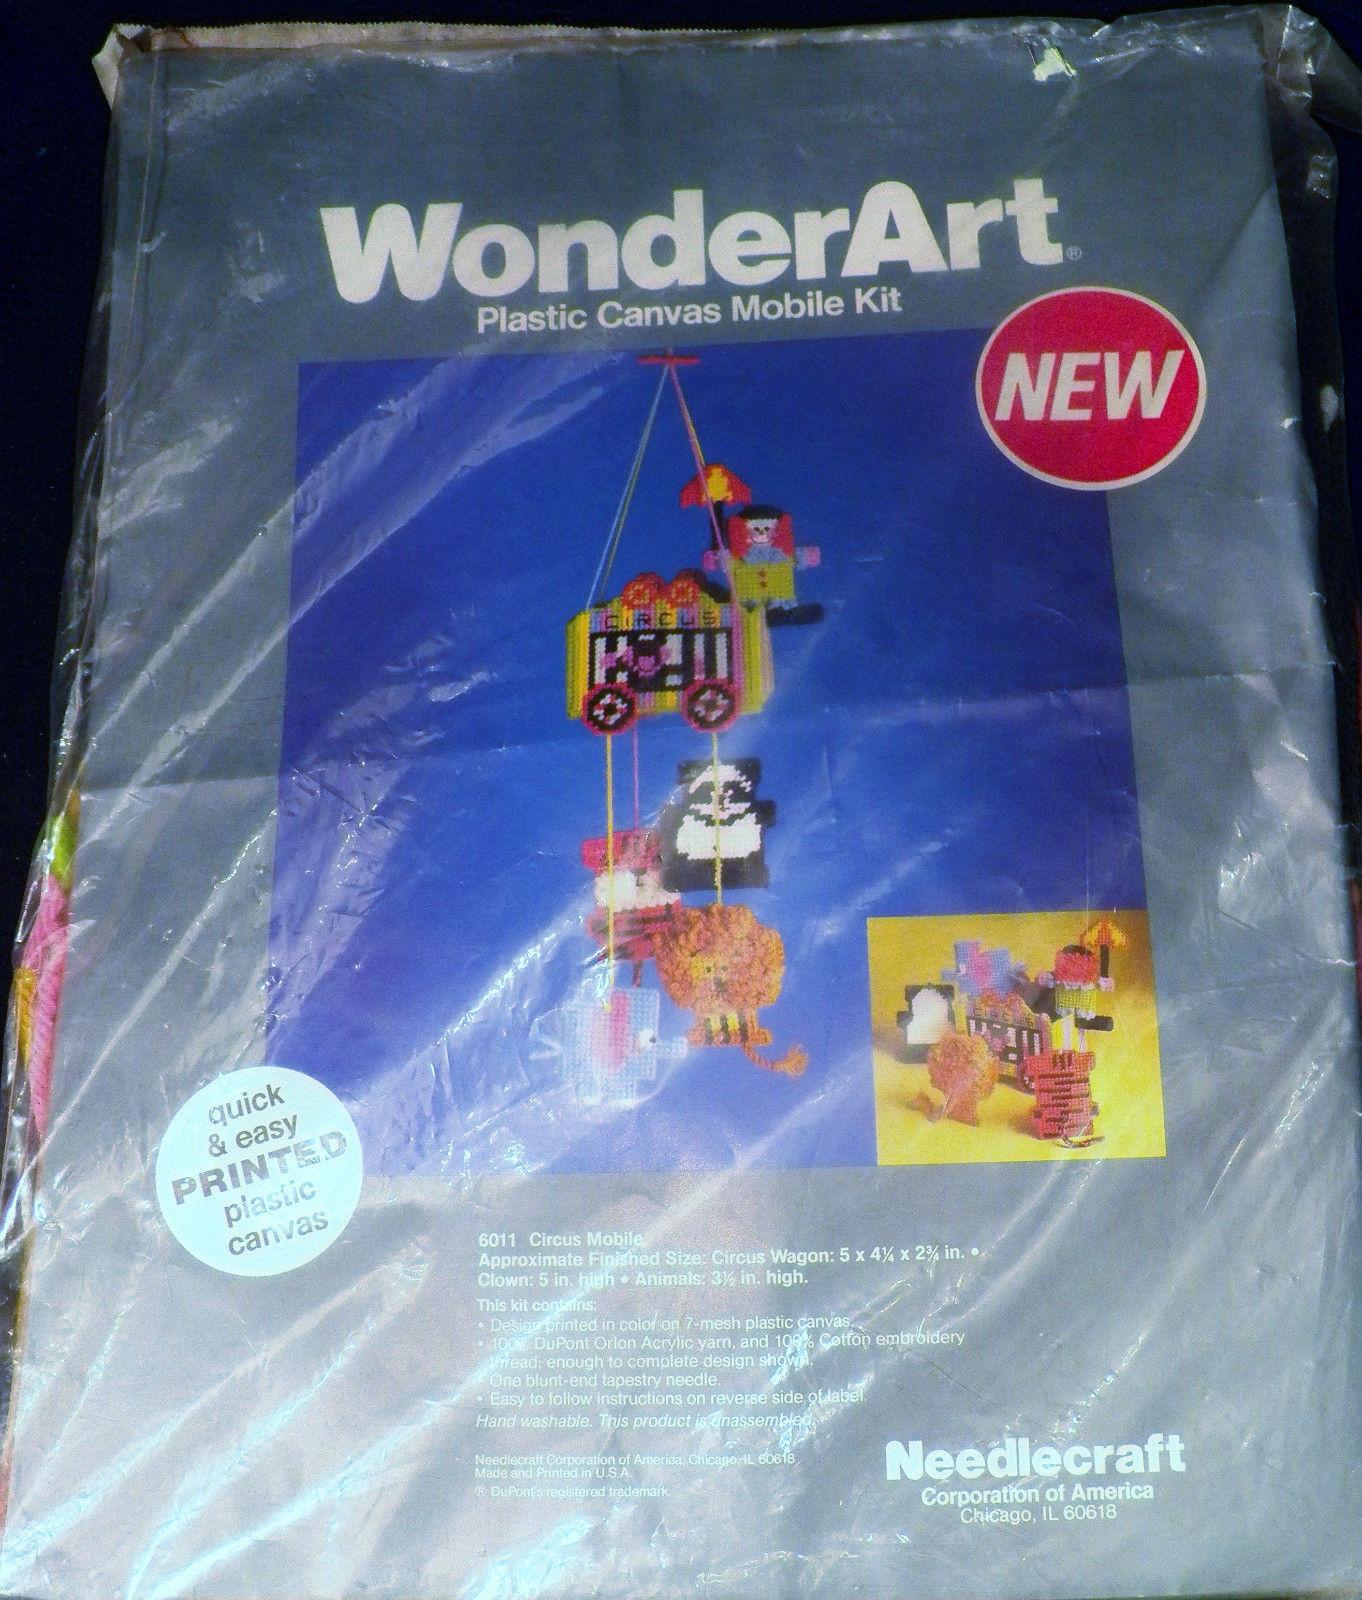 Vintage Needlecraft WonderArt Baby Nursery Circus Mobile Plastic Canvas Kit 6011